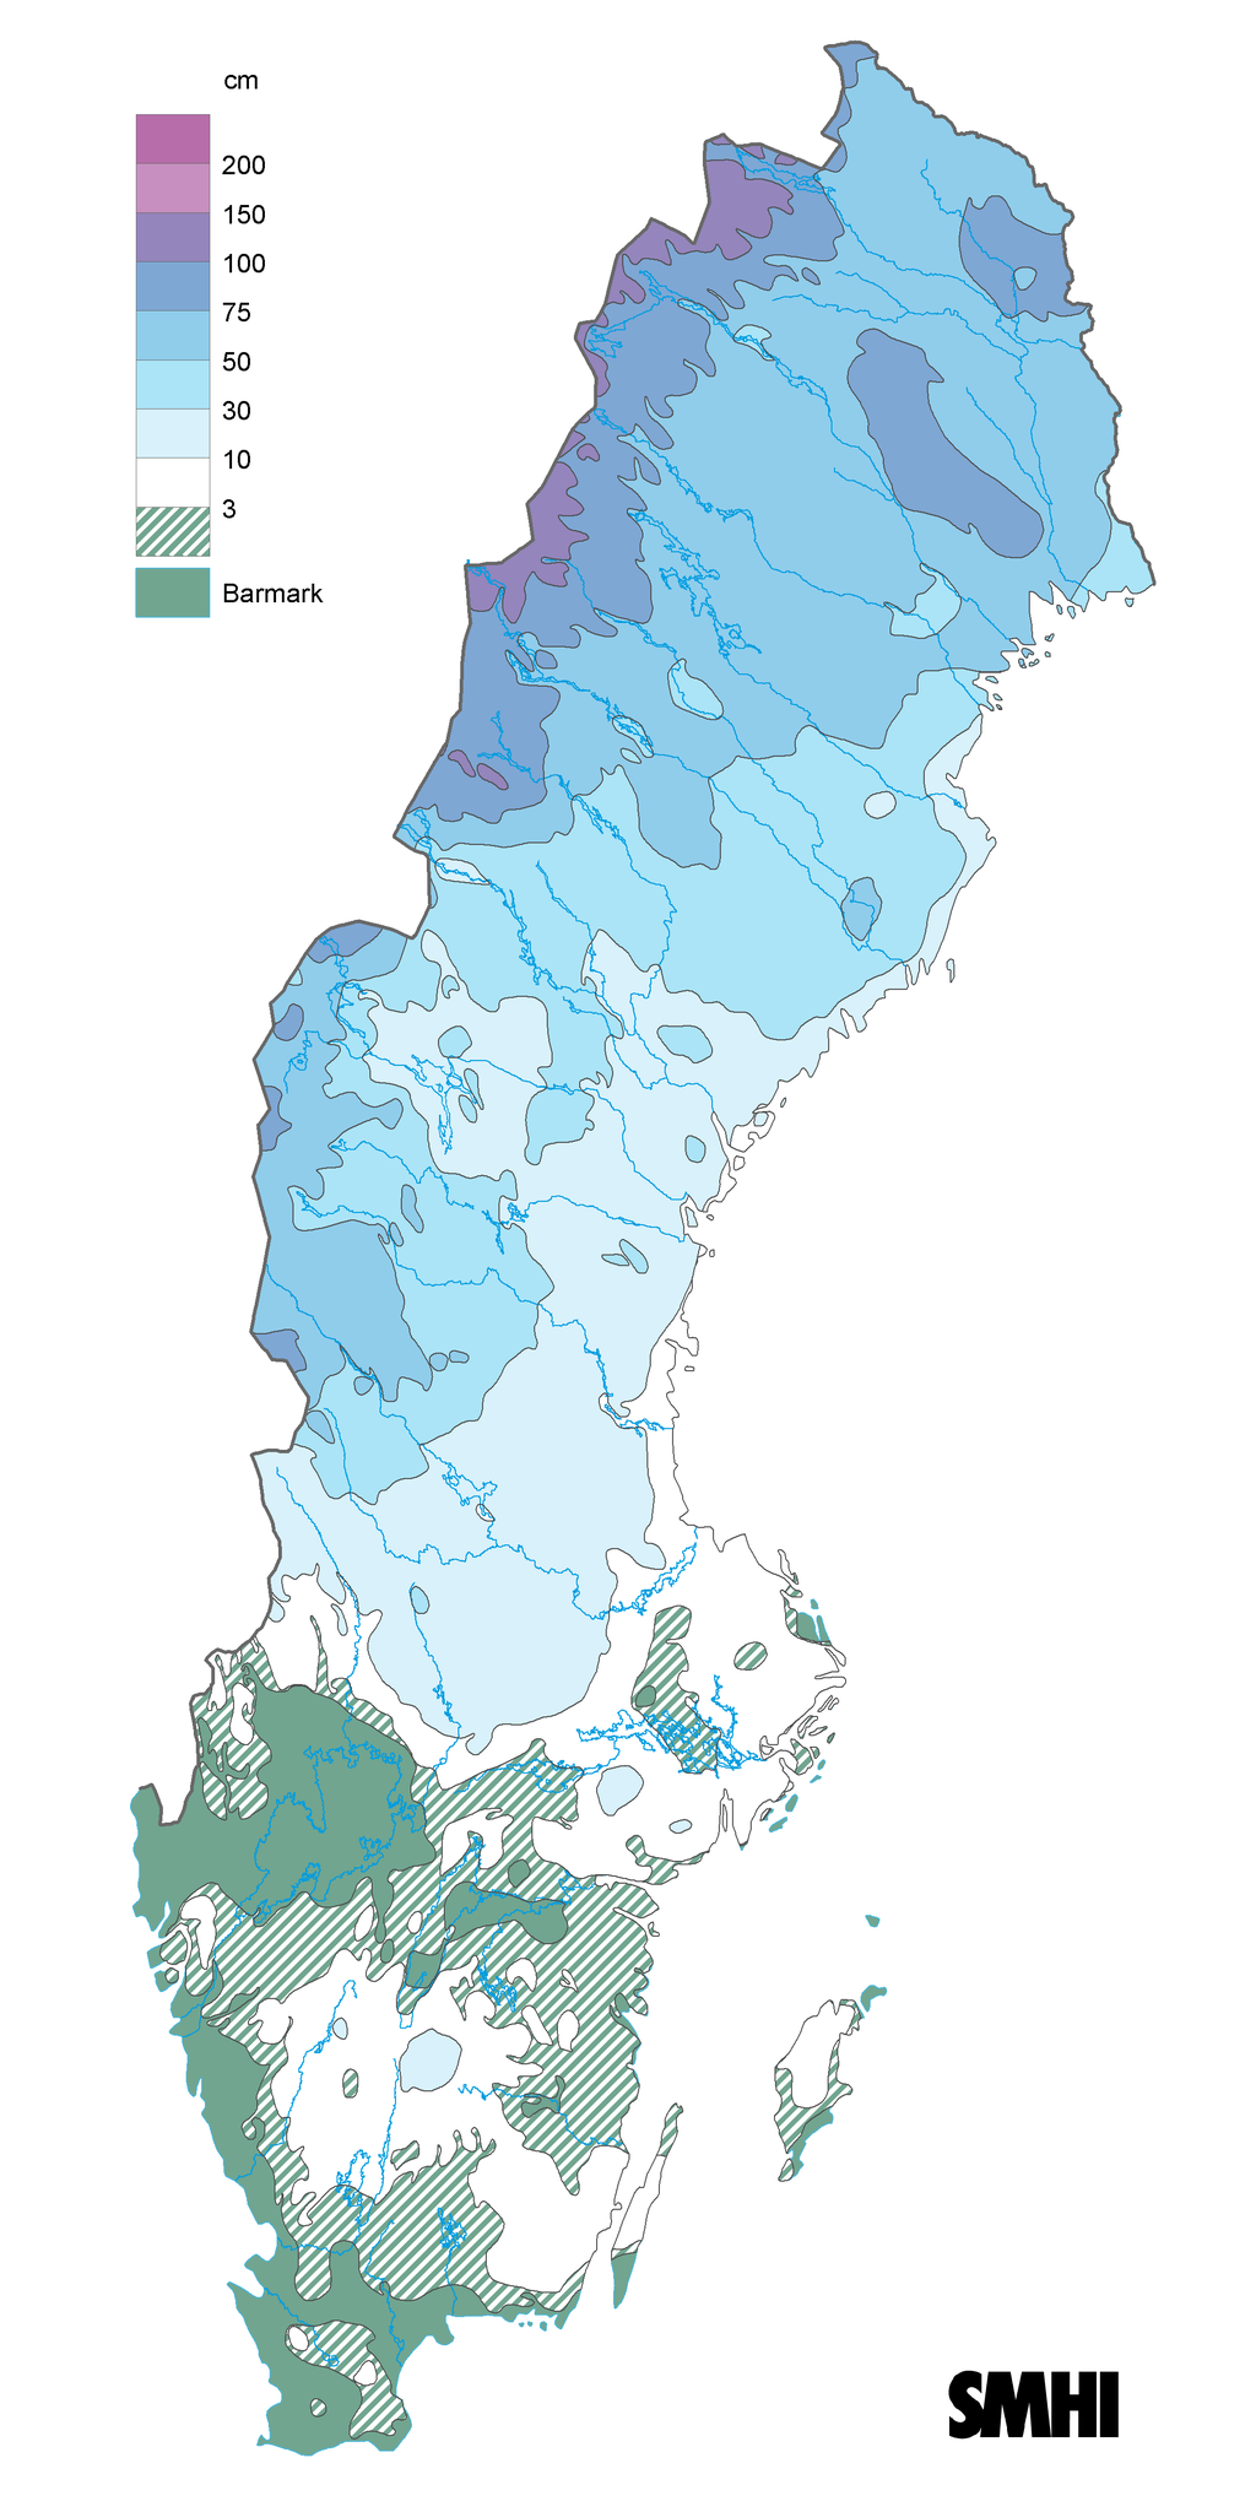 karta satellit sverige Januari 2017   Nytt vindrekord för Sverige | SMHI karta satellit sverige